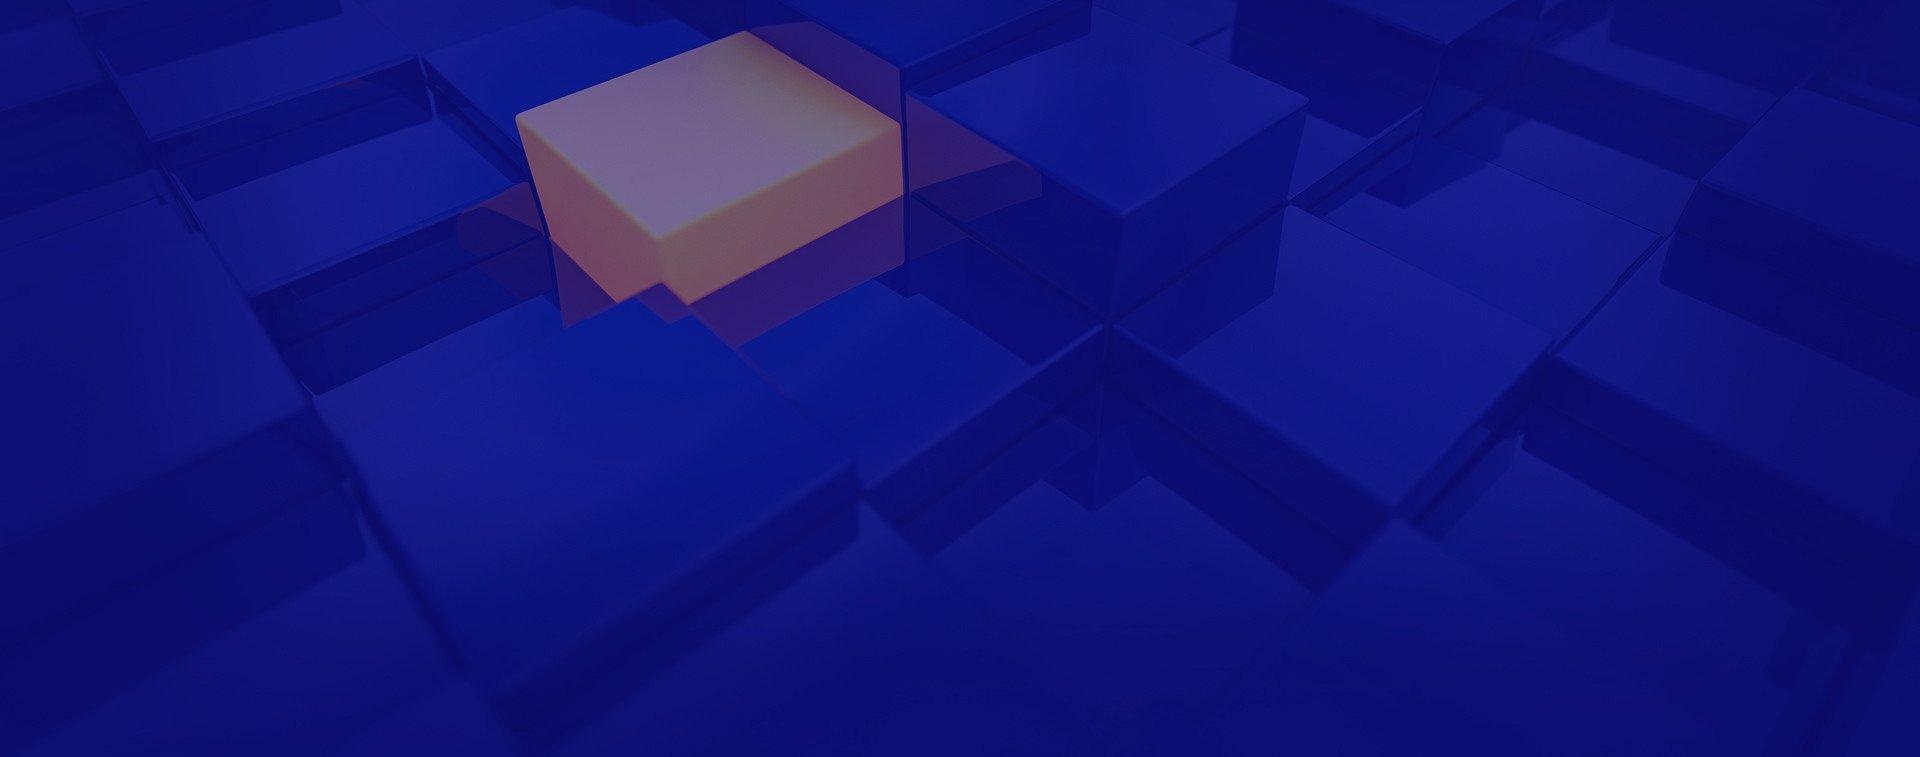 Architecture-Background-wide-1